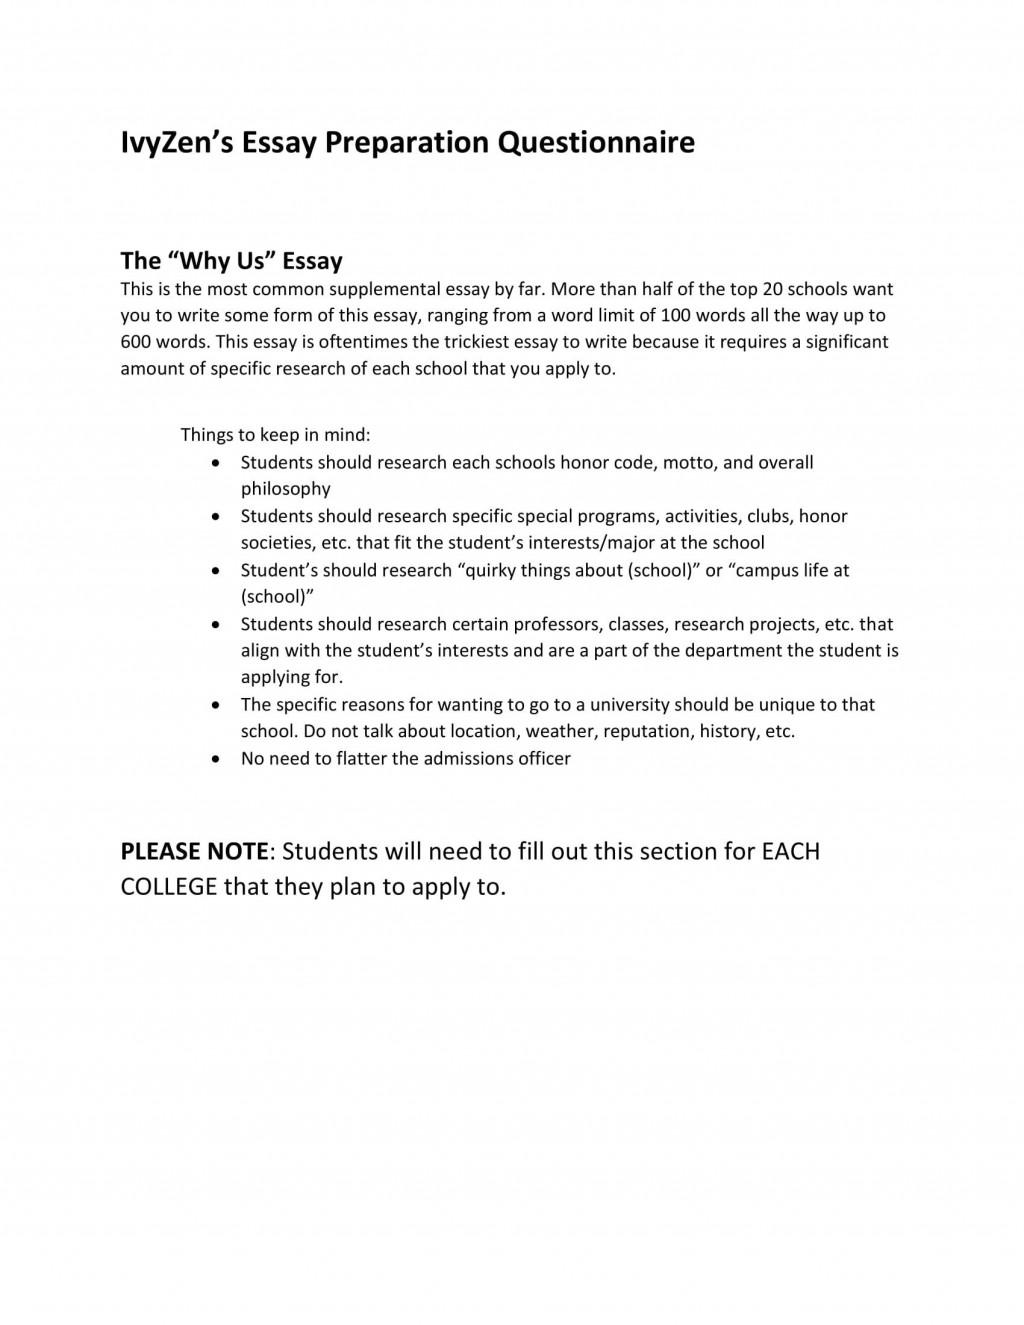 010 Module 1fit17002c2200ssl1 Essay Example College Surprising Organizer Application Graphic Organizers Argumentative Large